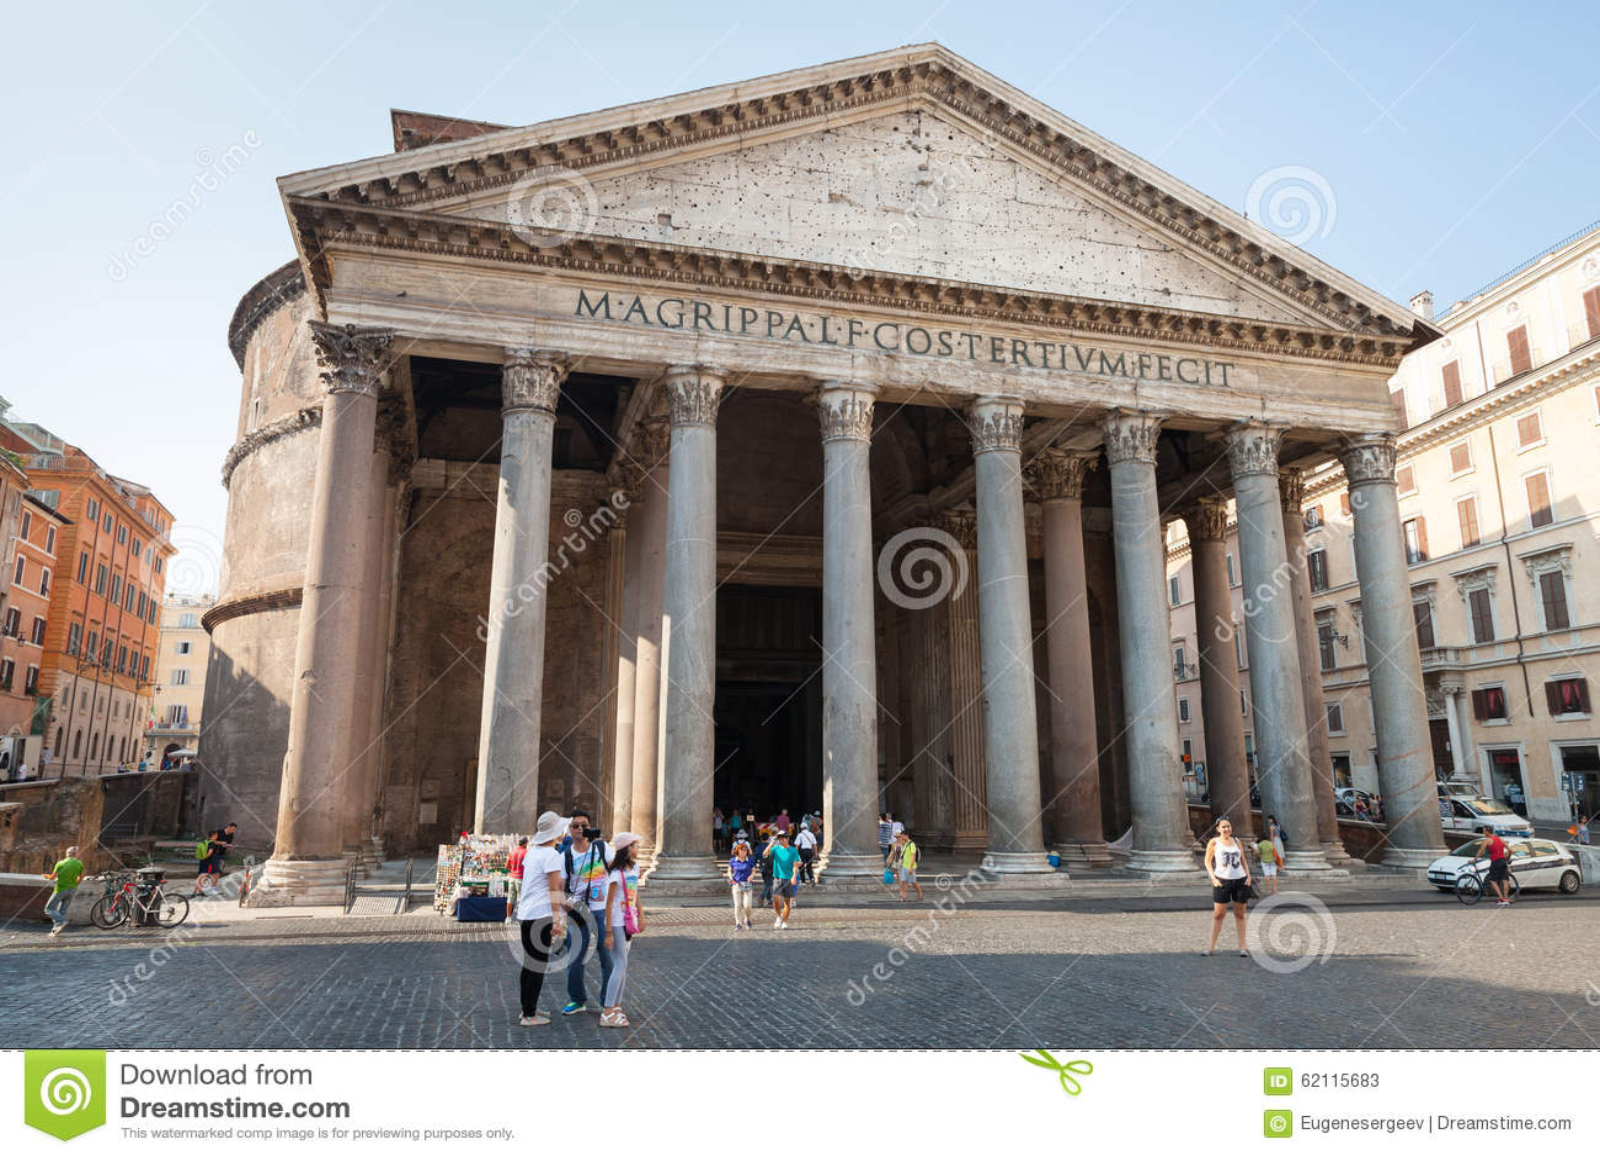 Pantheon ancient roman building facade editorial stock for Esterno pantheon